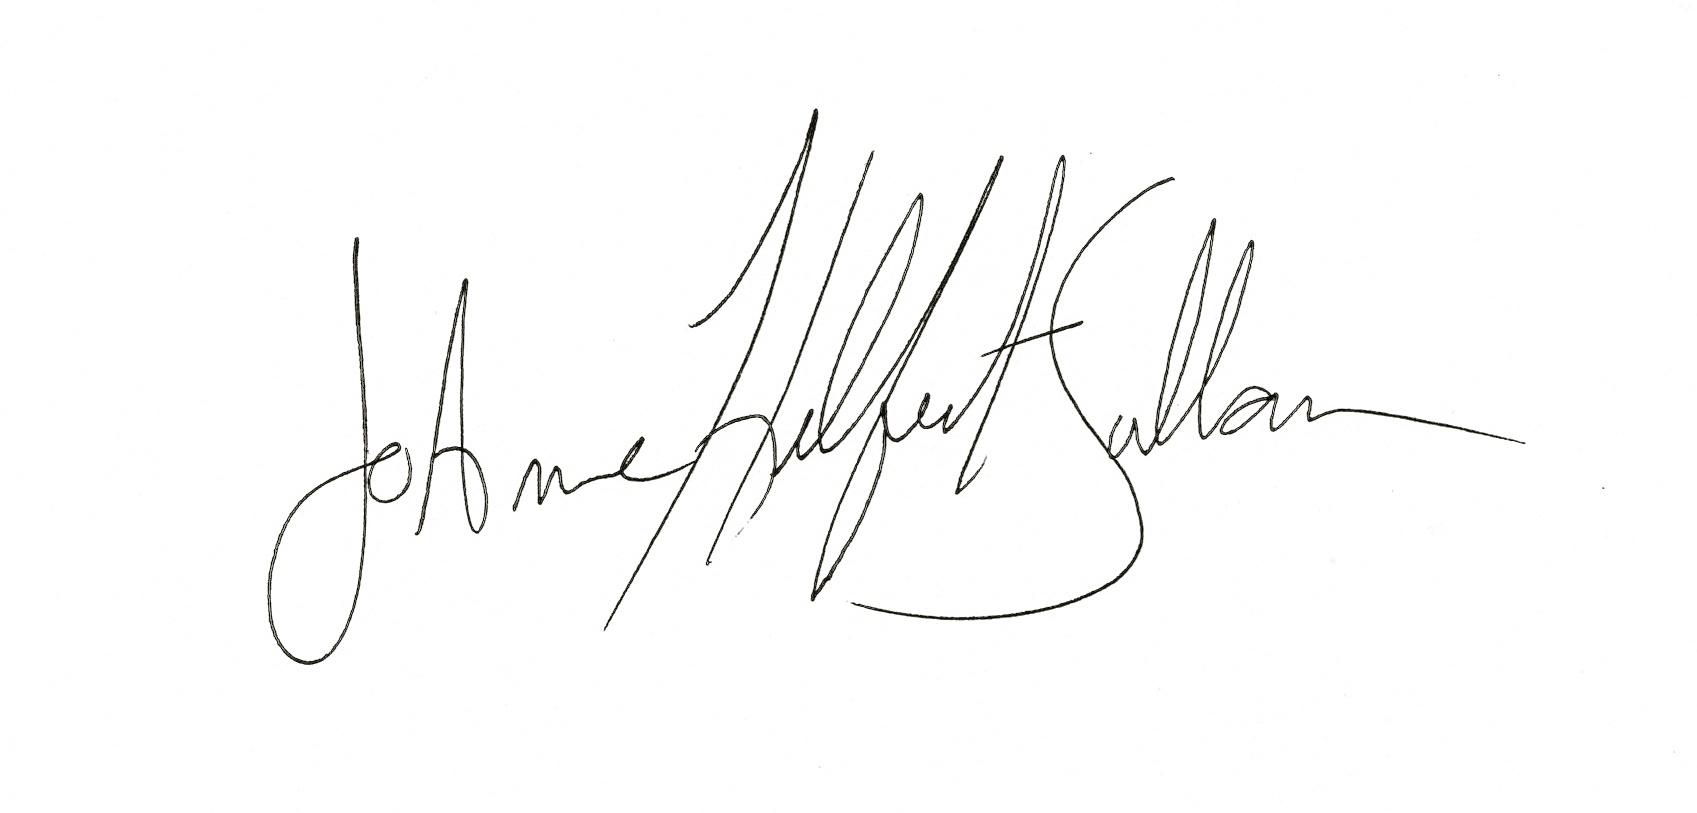 JoAnne Helfert Sullam Signature